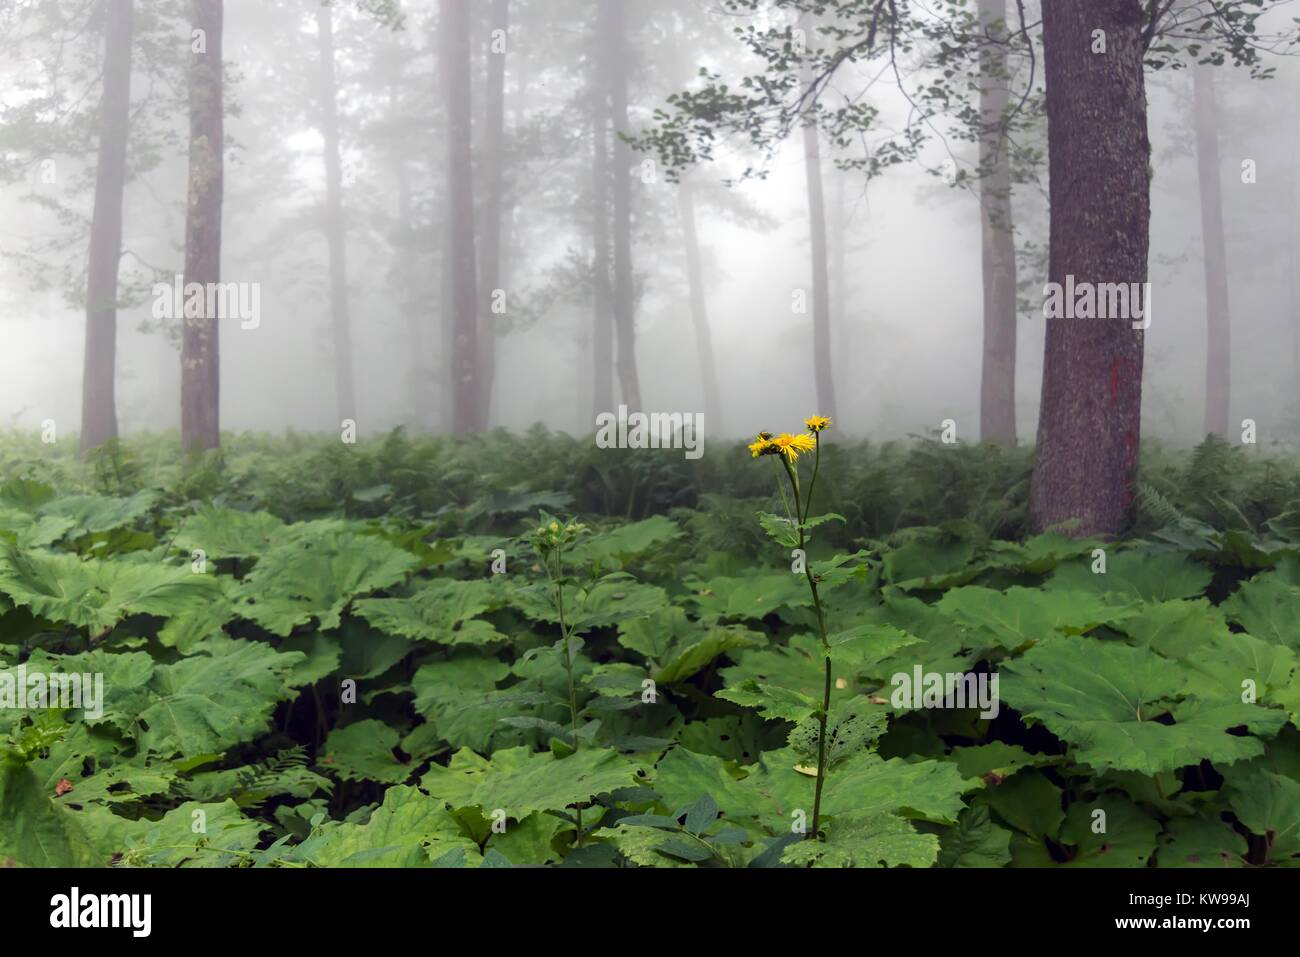 Wild fflowers and plants araound the lake Karagol,Borcka,Artvin Turkey. Stock Photo